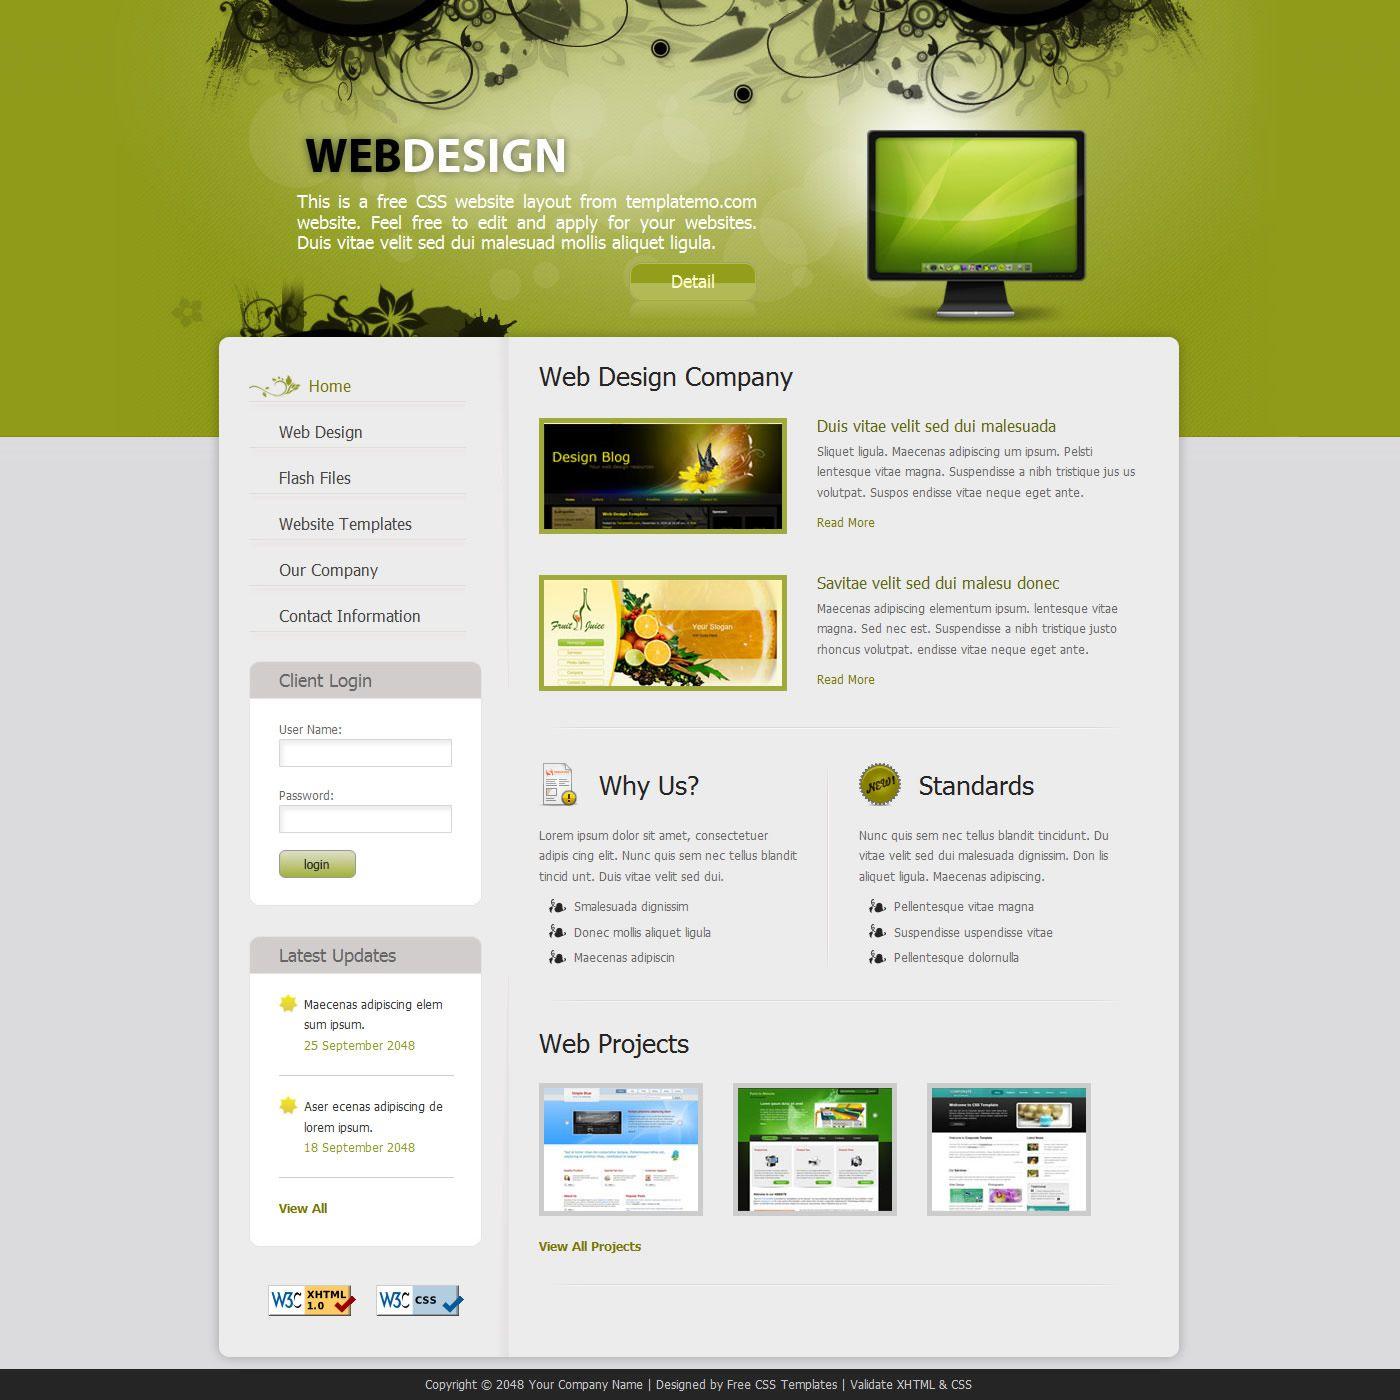 009 Sensational Free Professional Web Design Template Sample  Templates Website DownloadFull